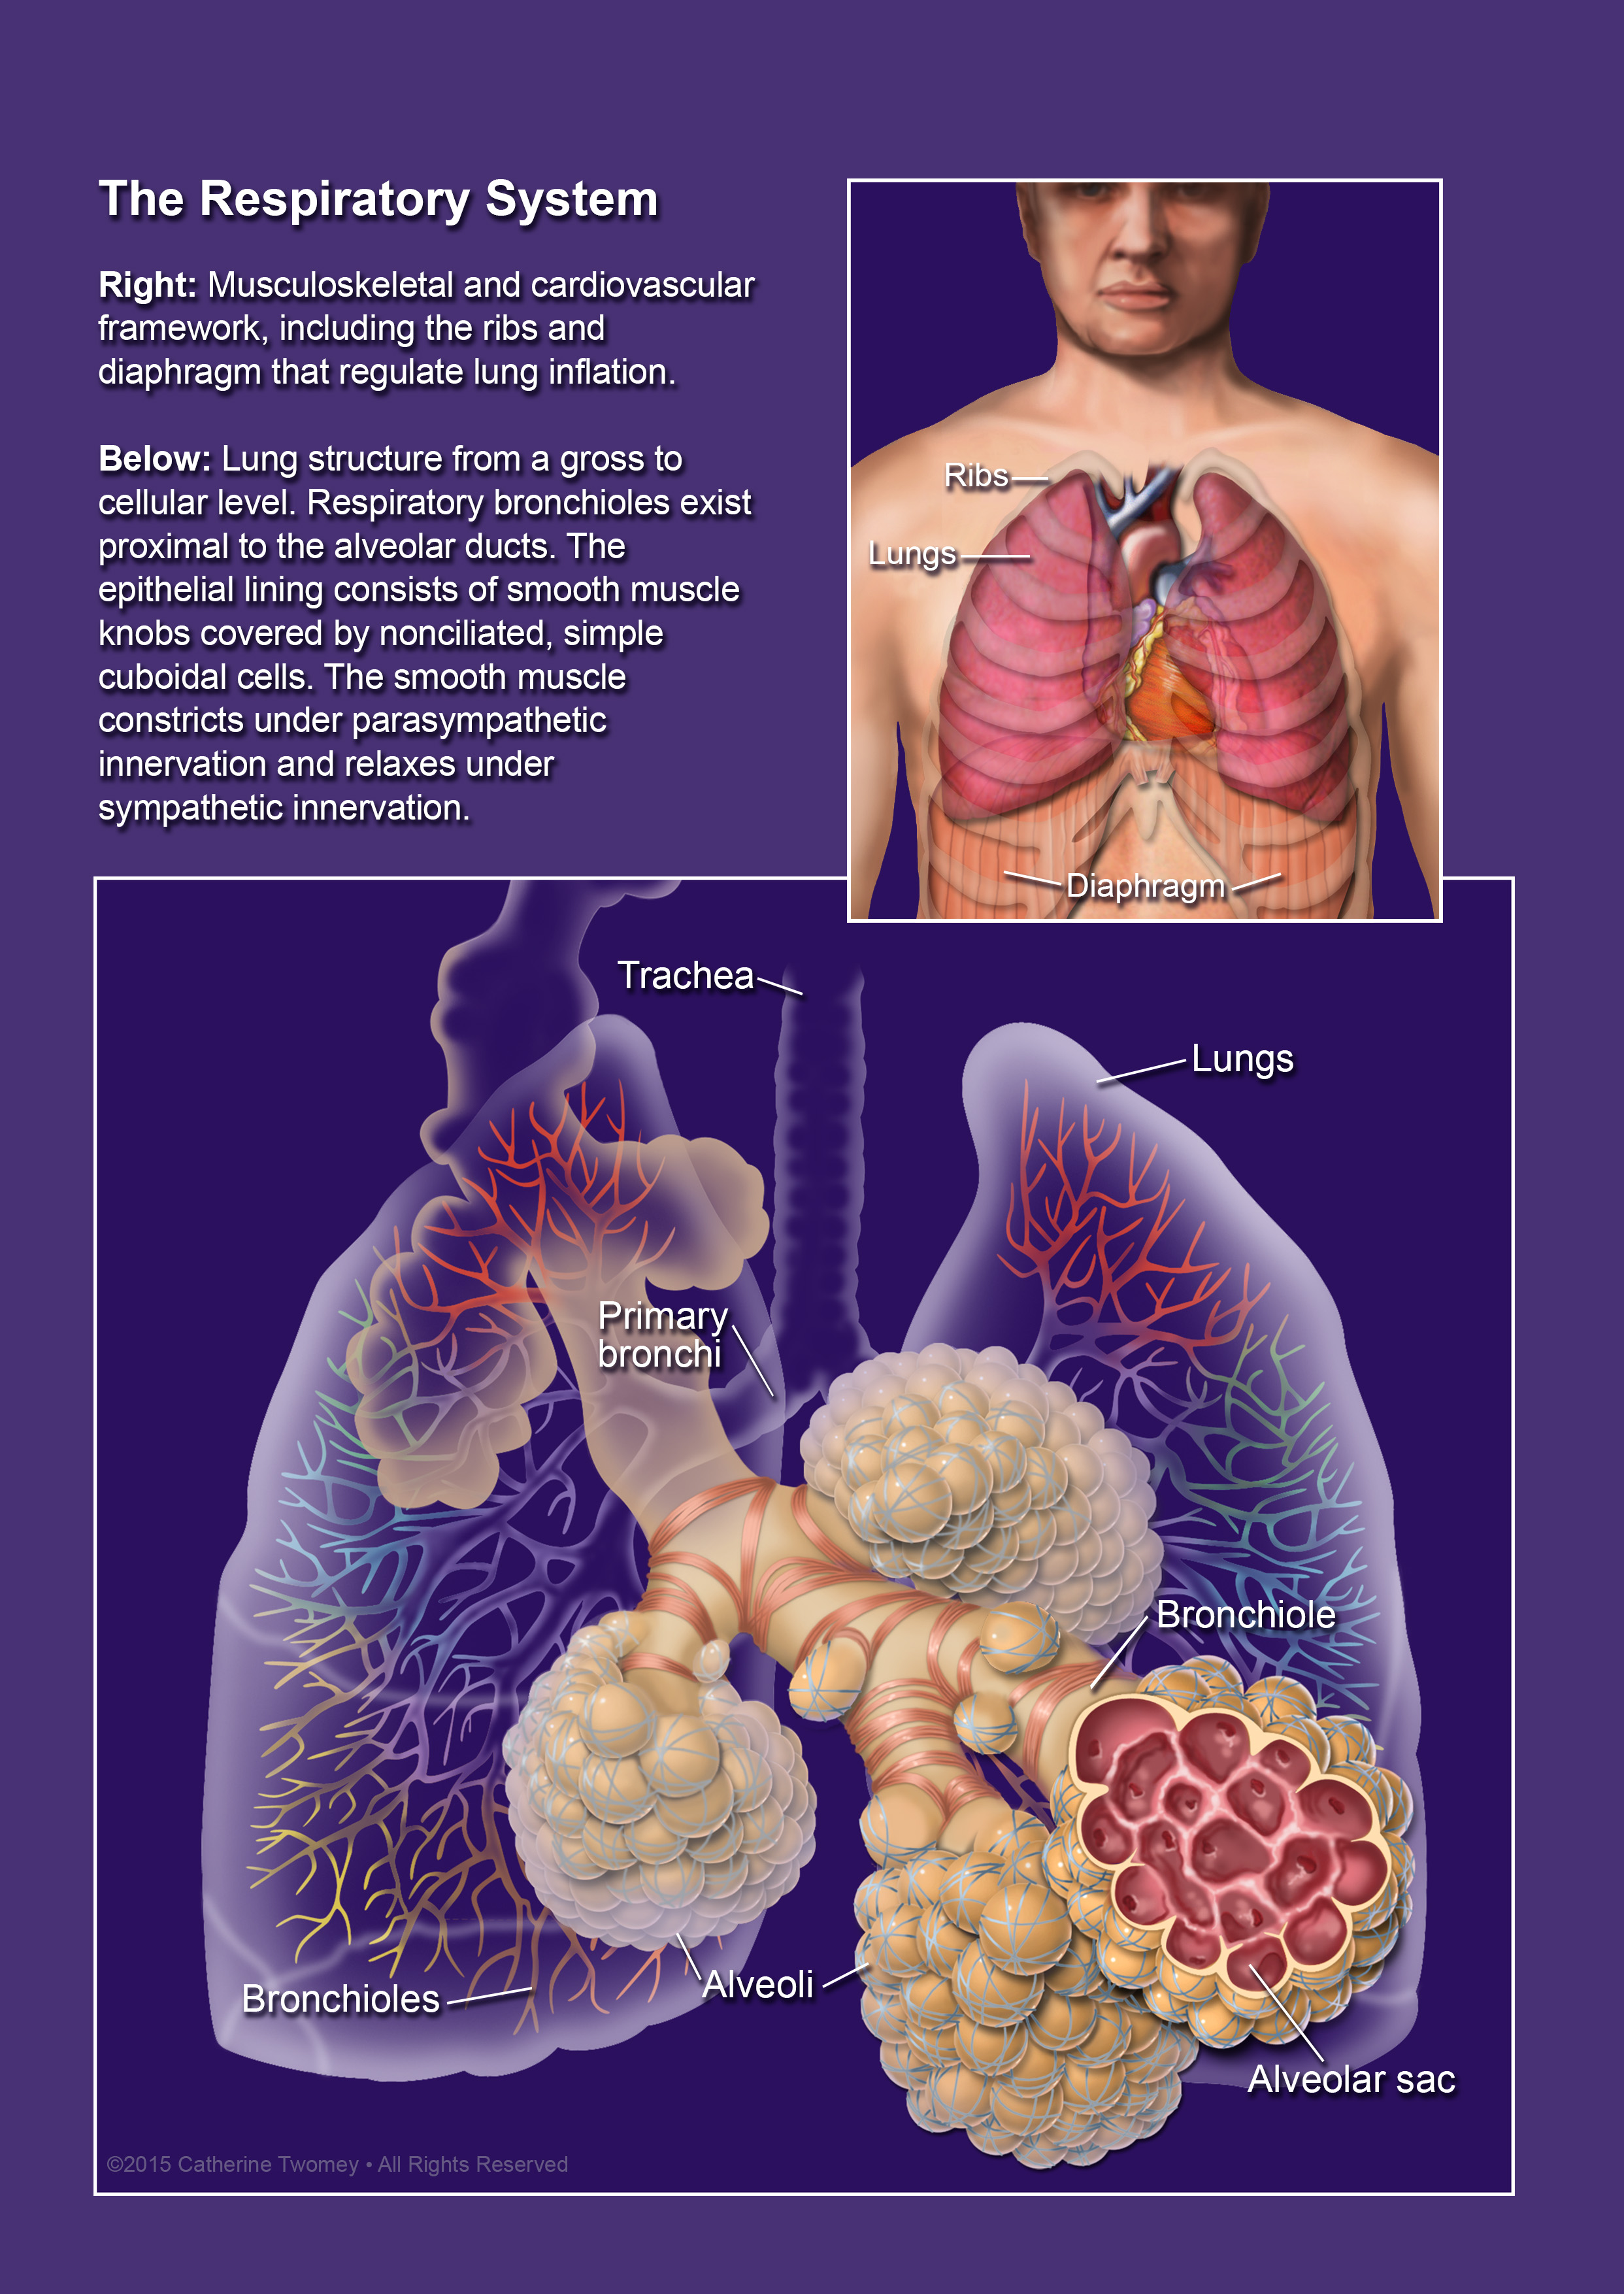 RespiratorySystemGrossandCellular.jpg